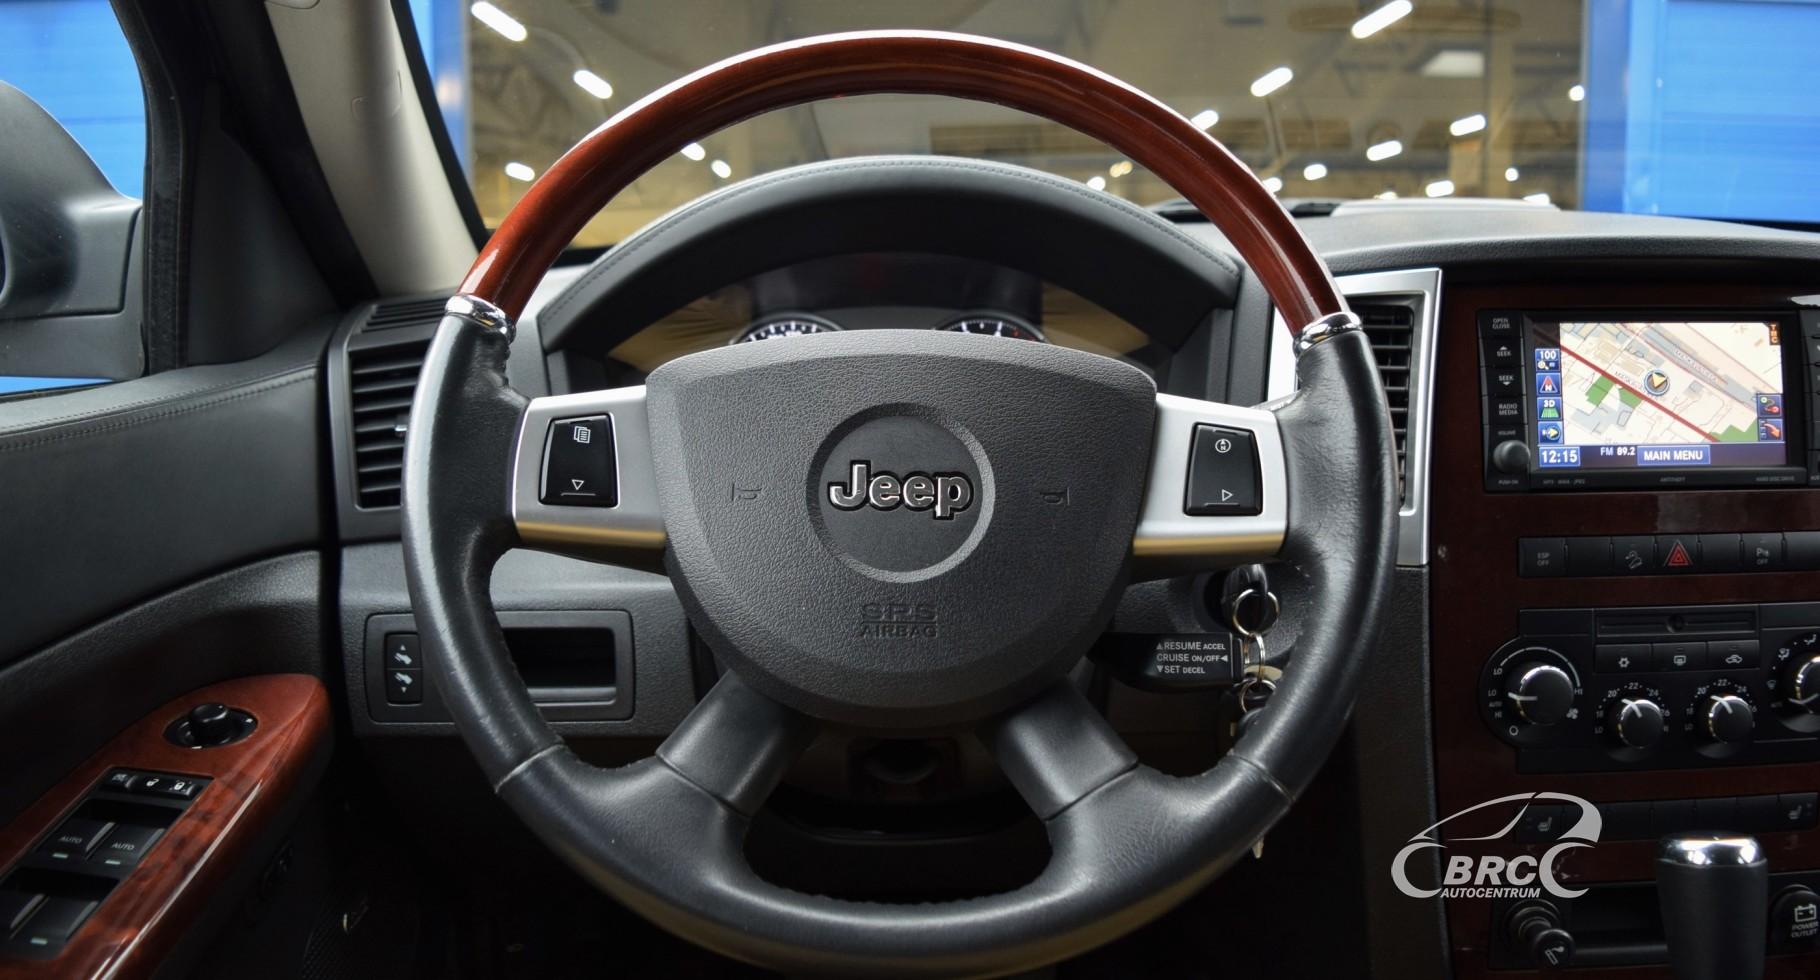 Jeep Grand Cherokee CRD Overland